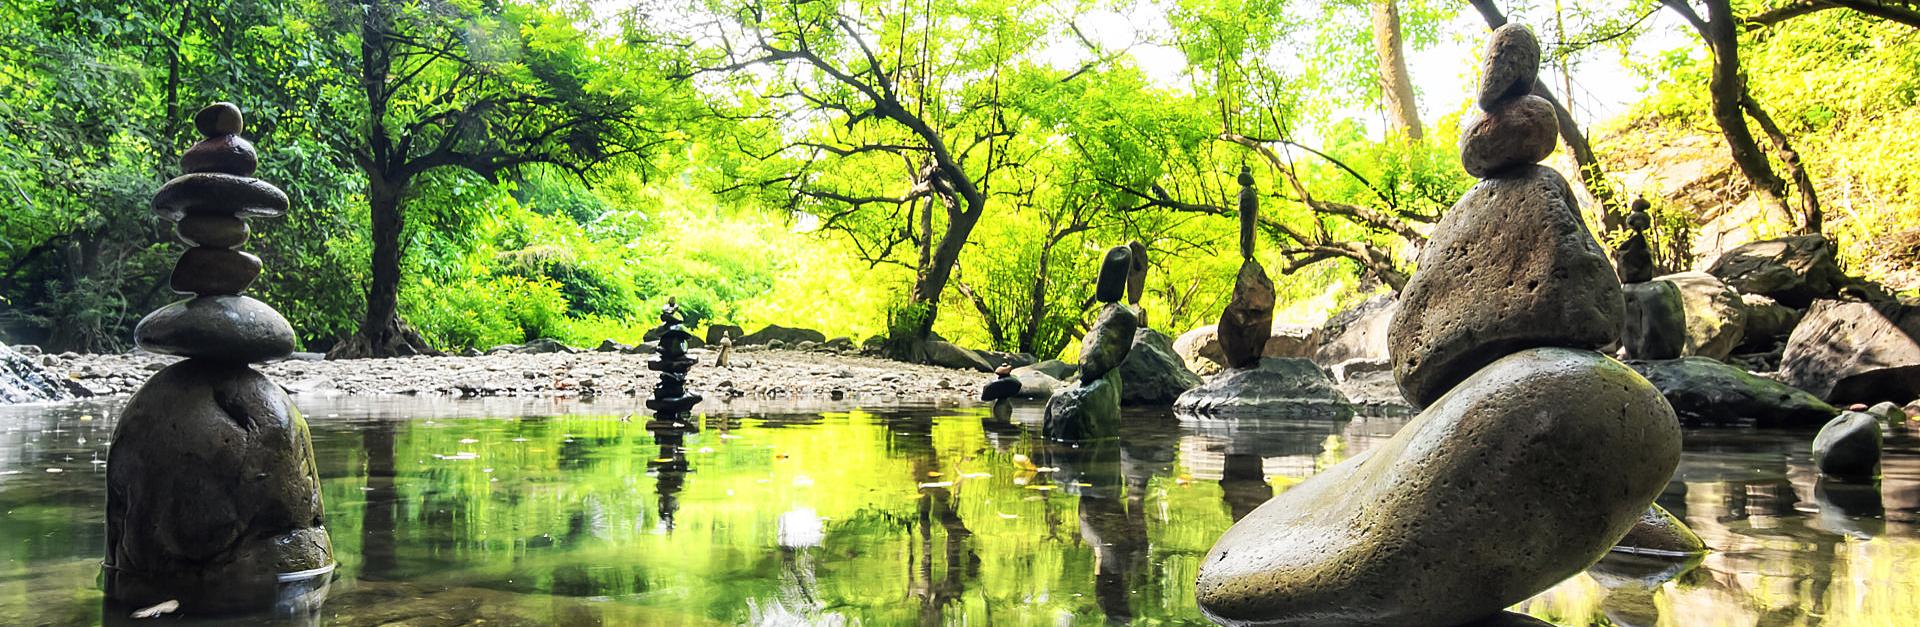 calm and spiritual nature environment